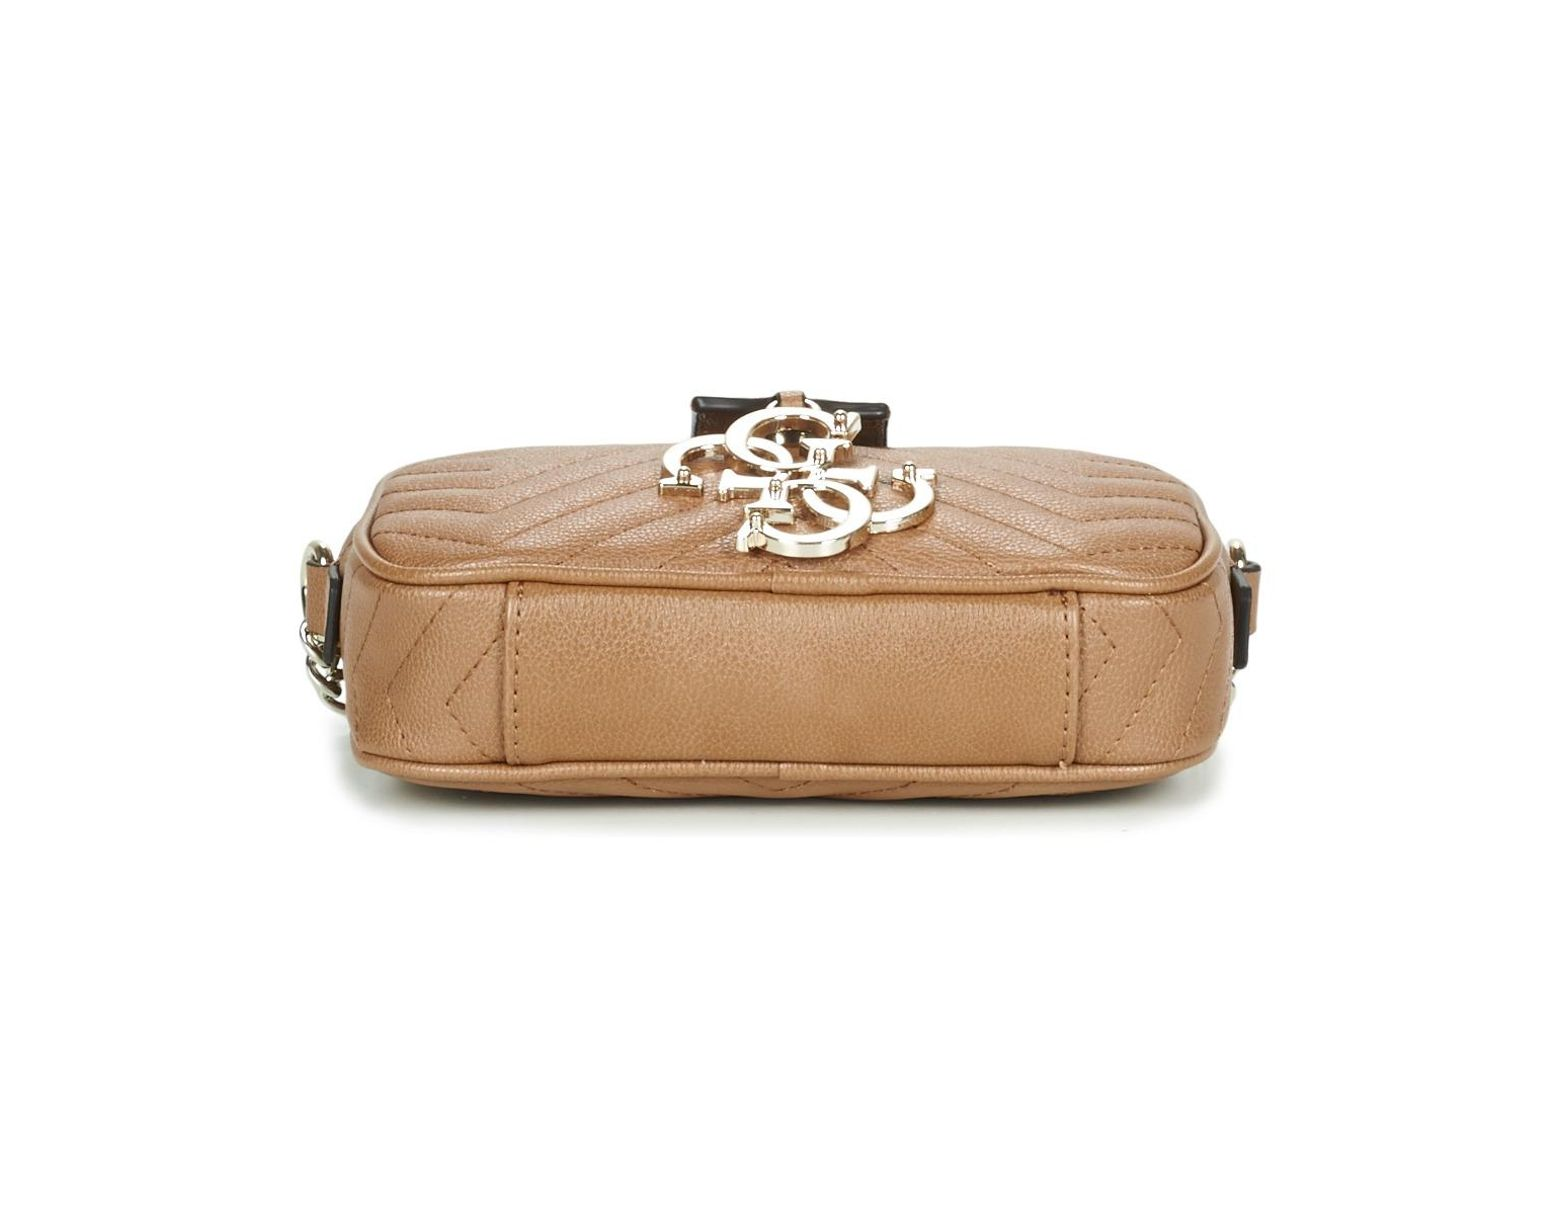 286f602ca9bf Guess Violet Mini Crossbody Camera Women's Shoulder Bag In Brown in Brown  for Men - Lyst